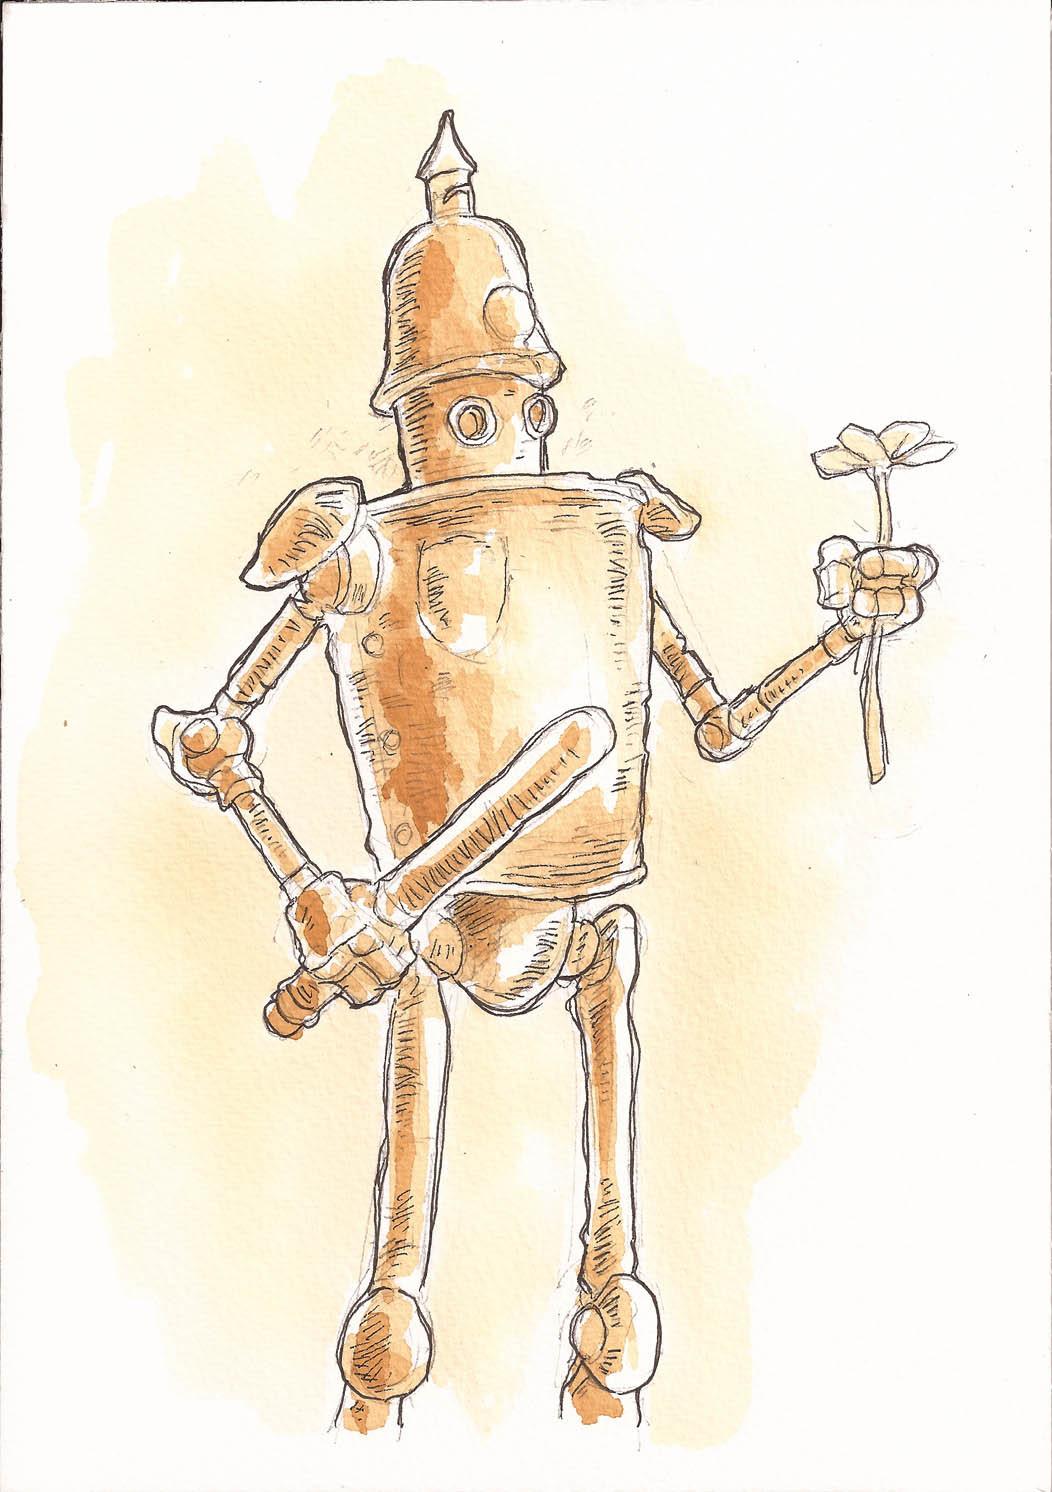 L.O.-L.O. copper bot!